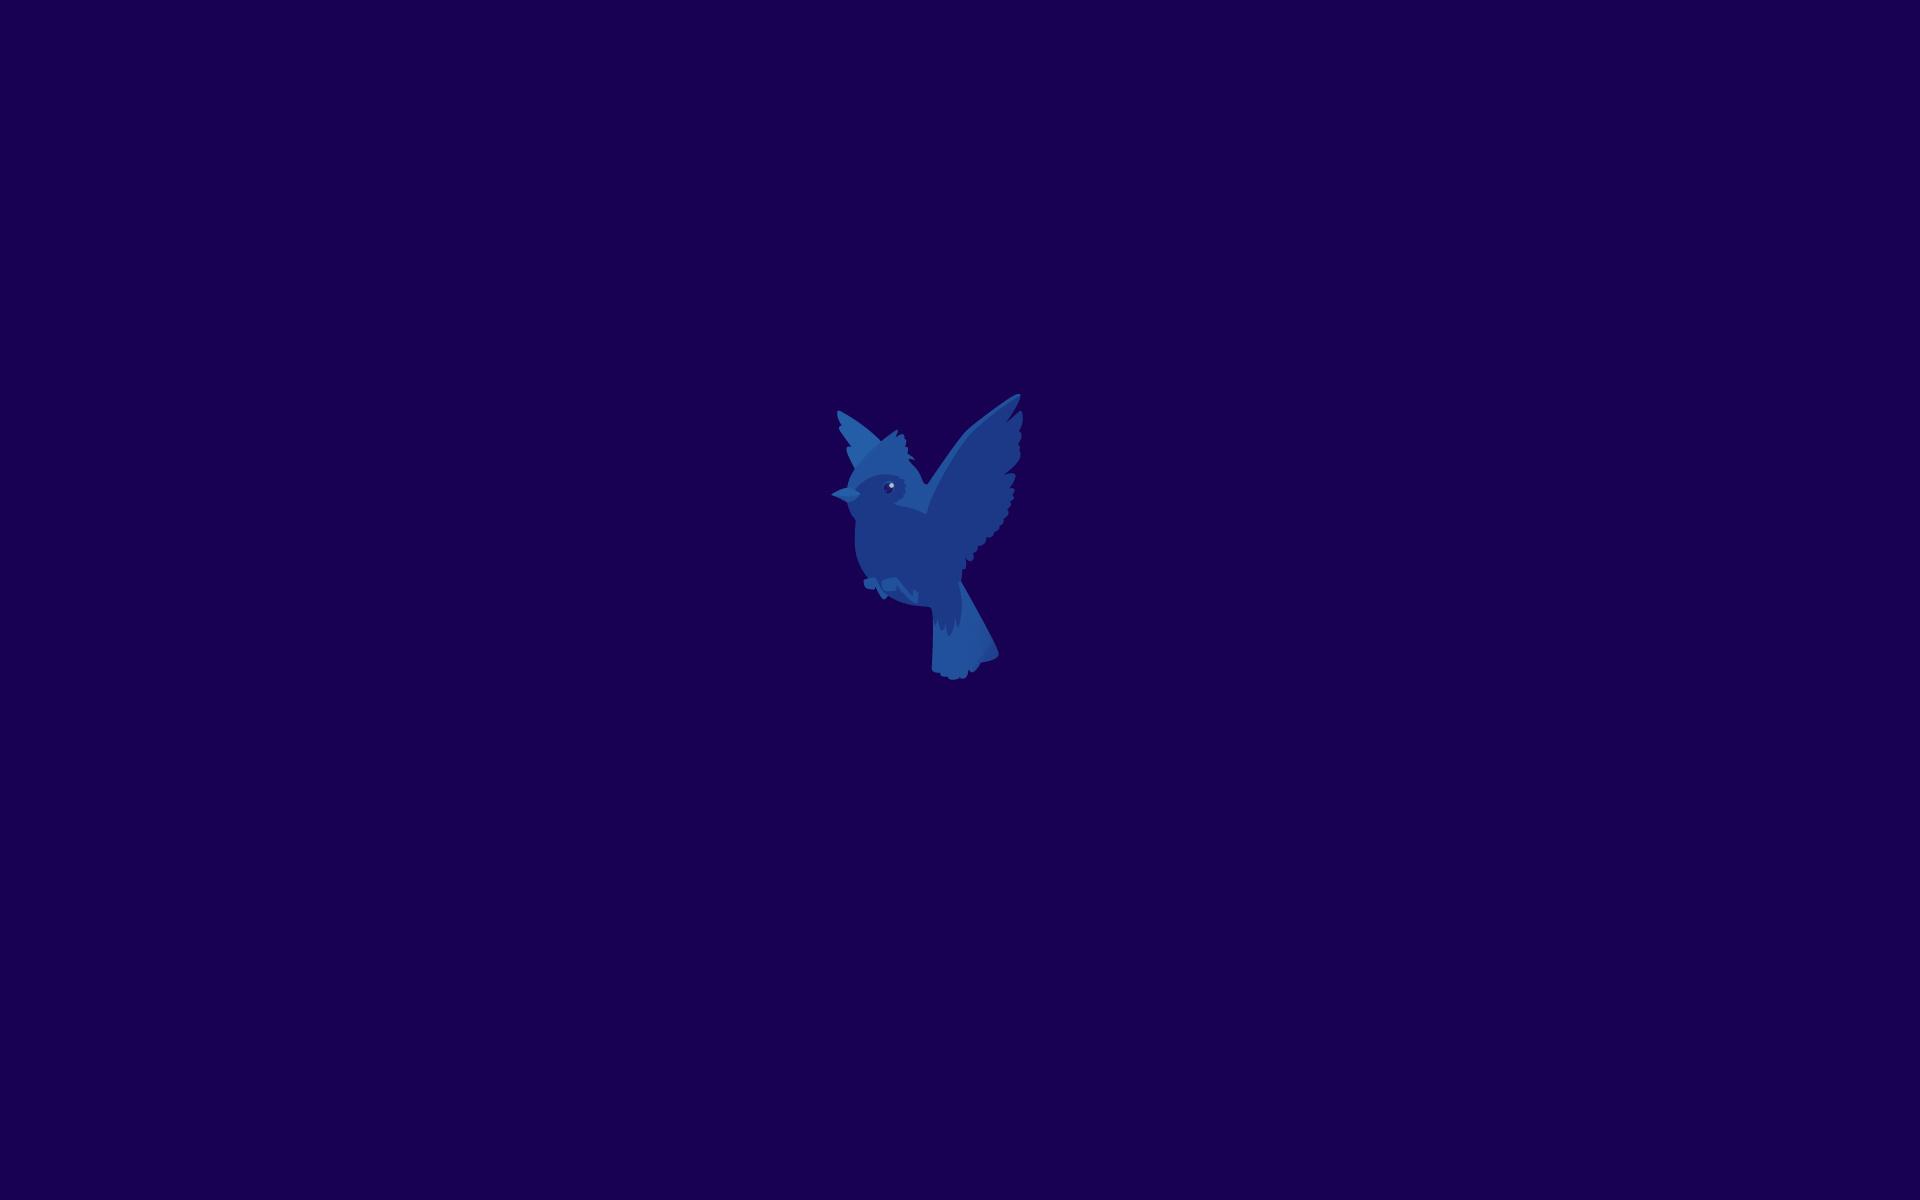 Good Wallpaper Naruto Blue - windows_8_pro_start_wallpaper_3___blue_bird_by_brebenel_silviu-d5a2pzm  HD_371956.jpg